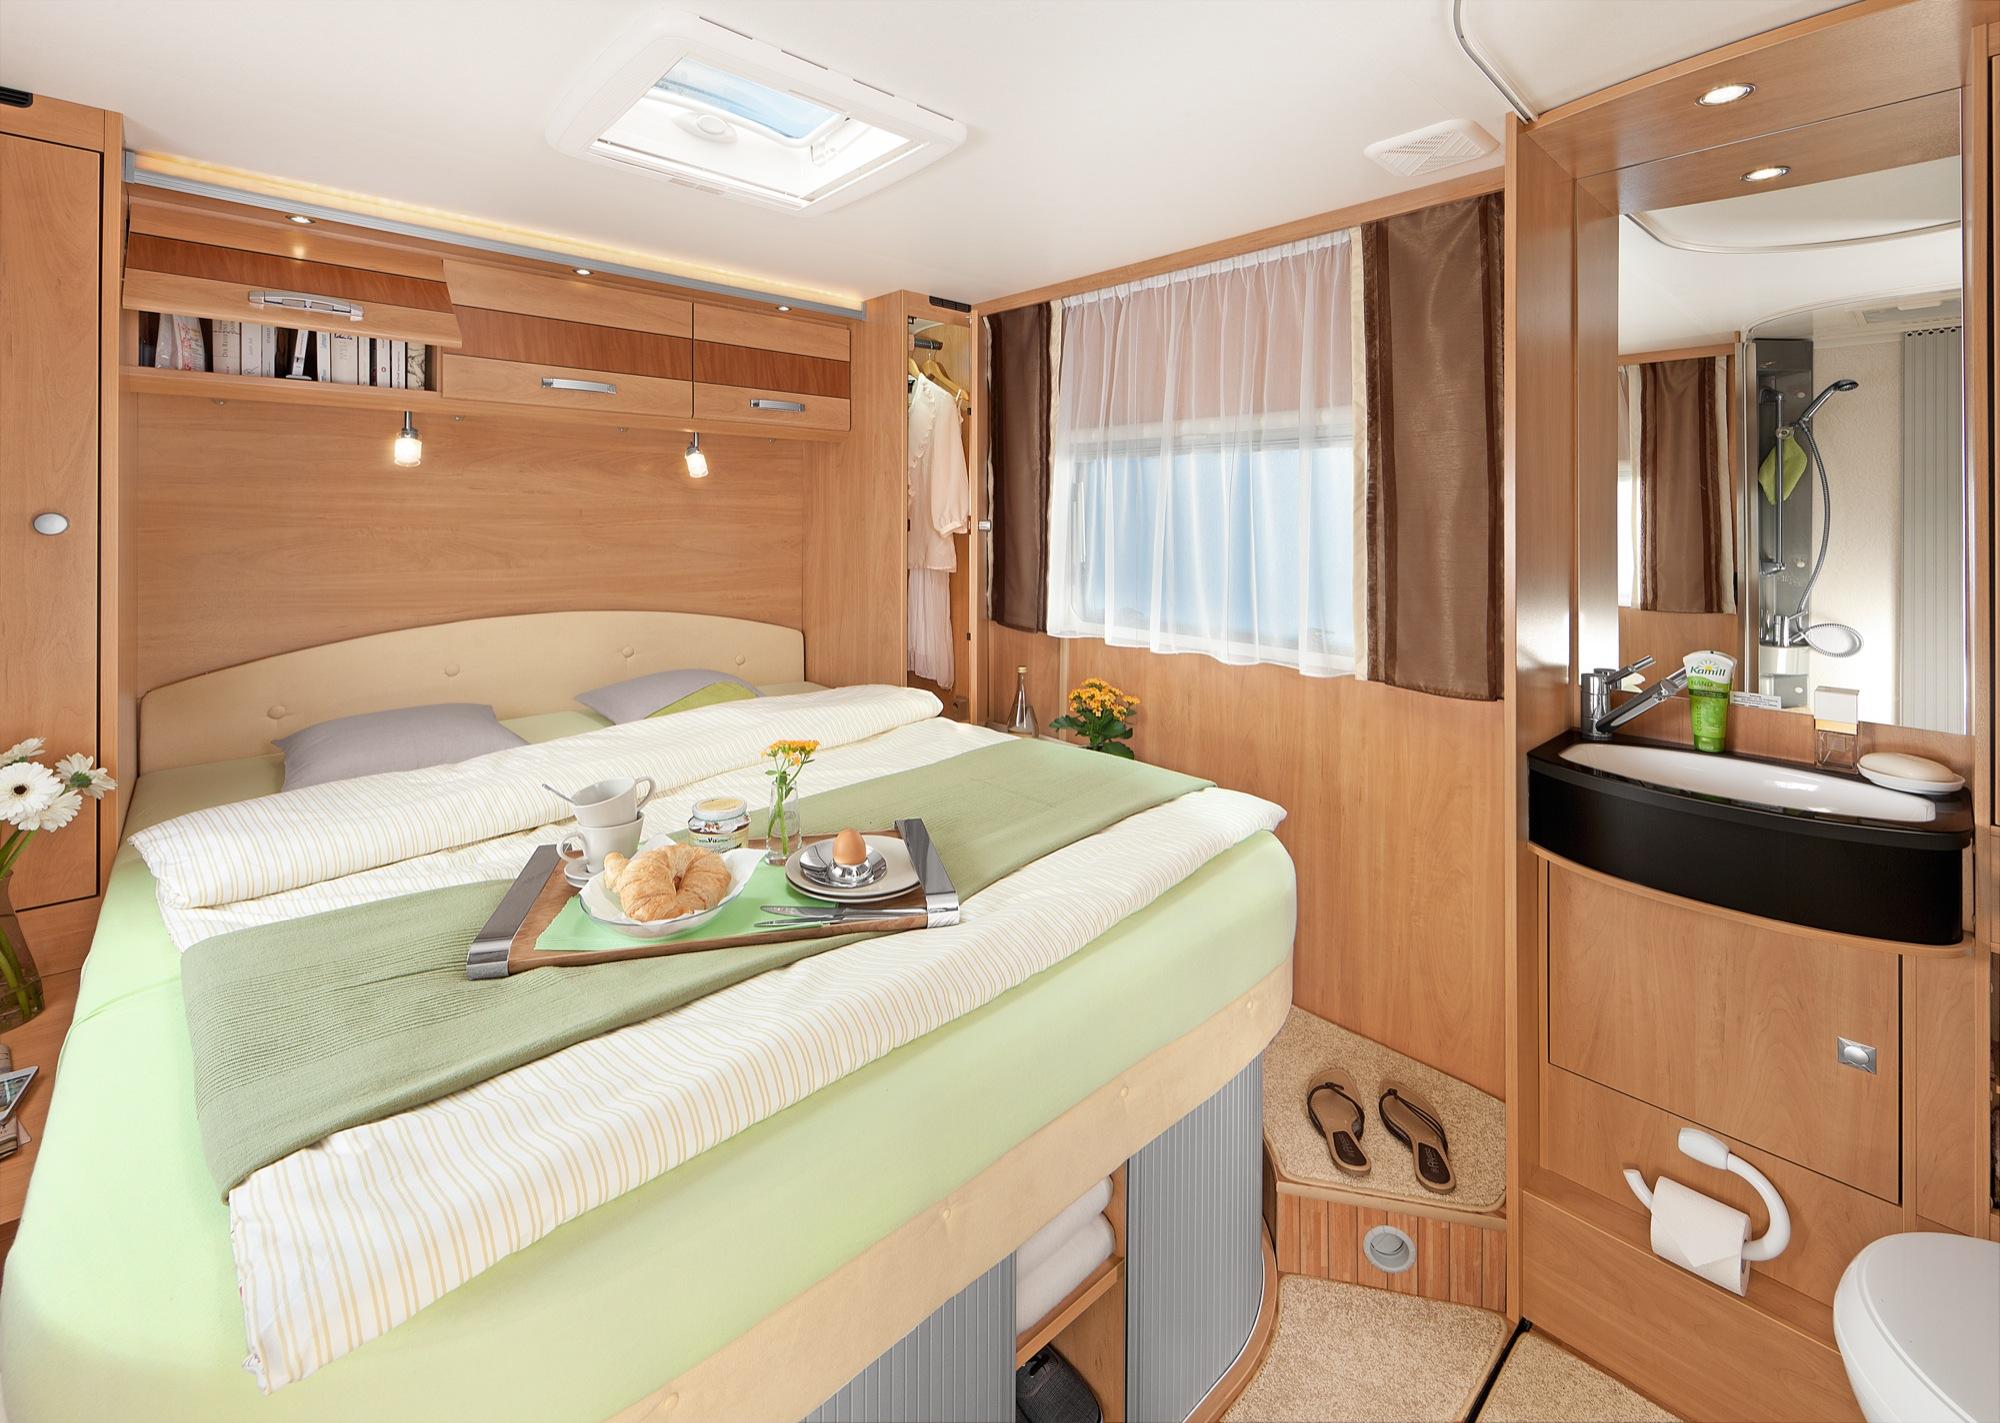 Location de Camping-Car en Norvège